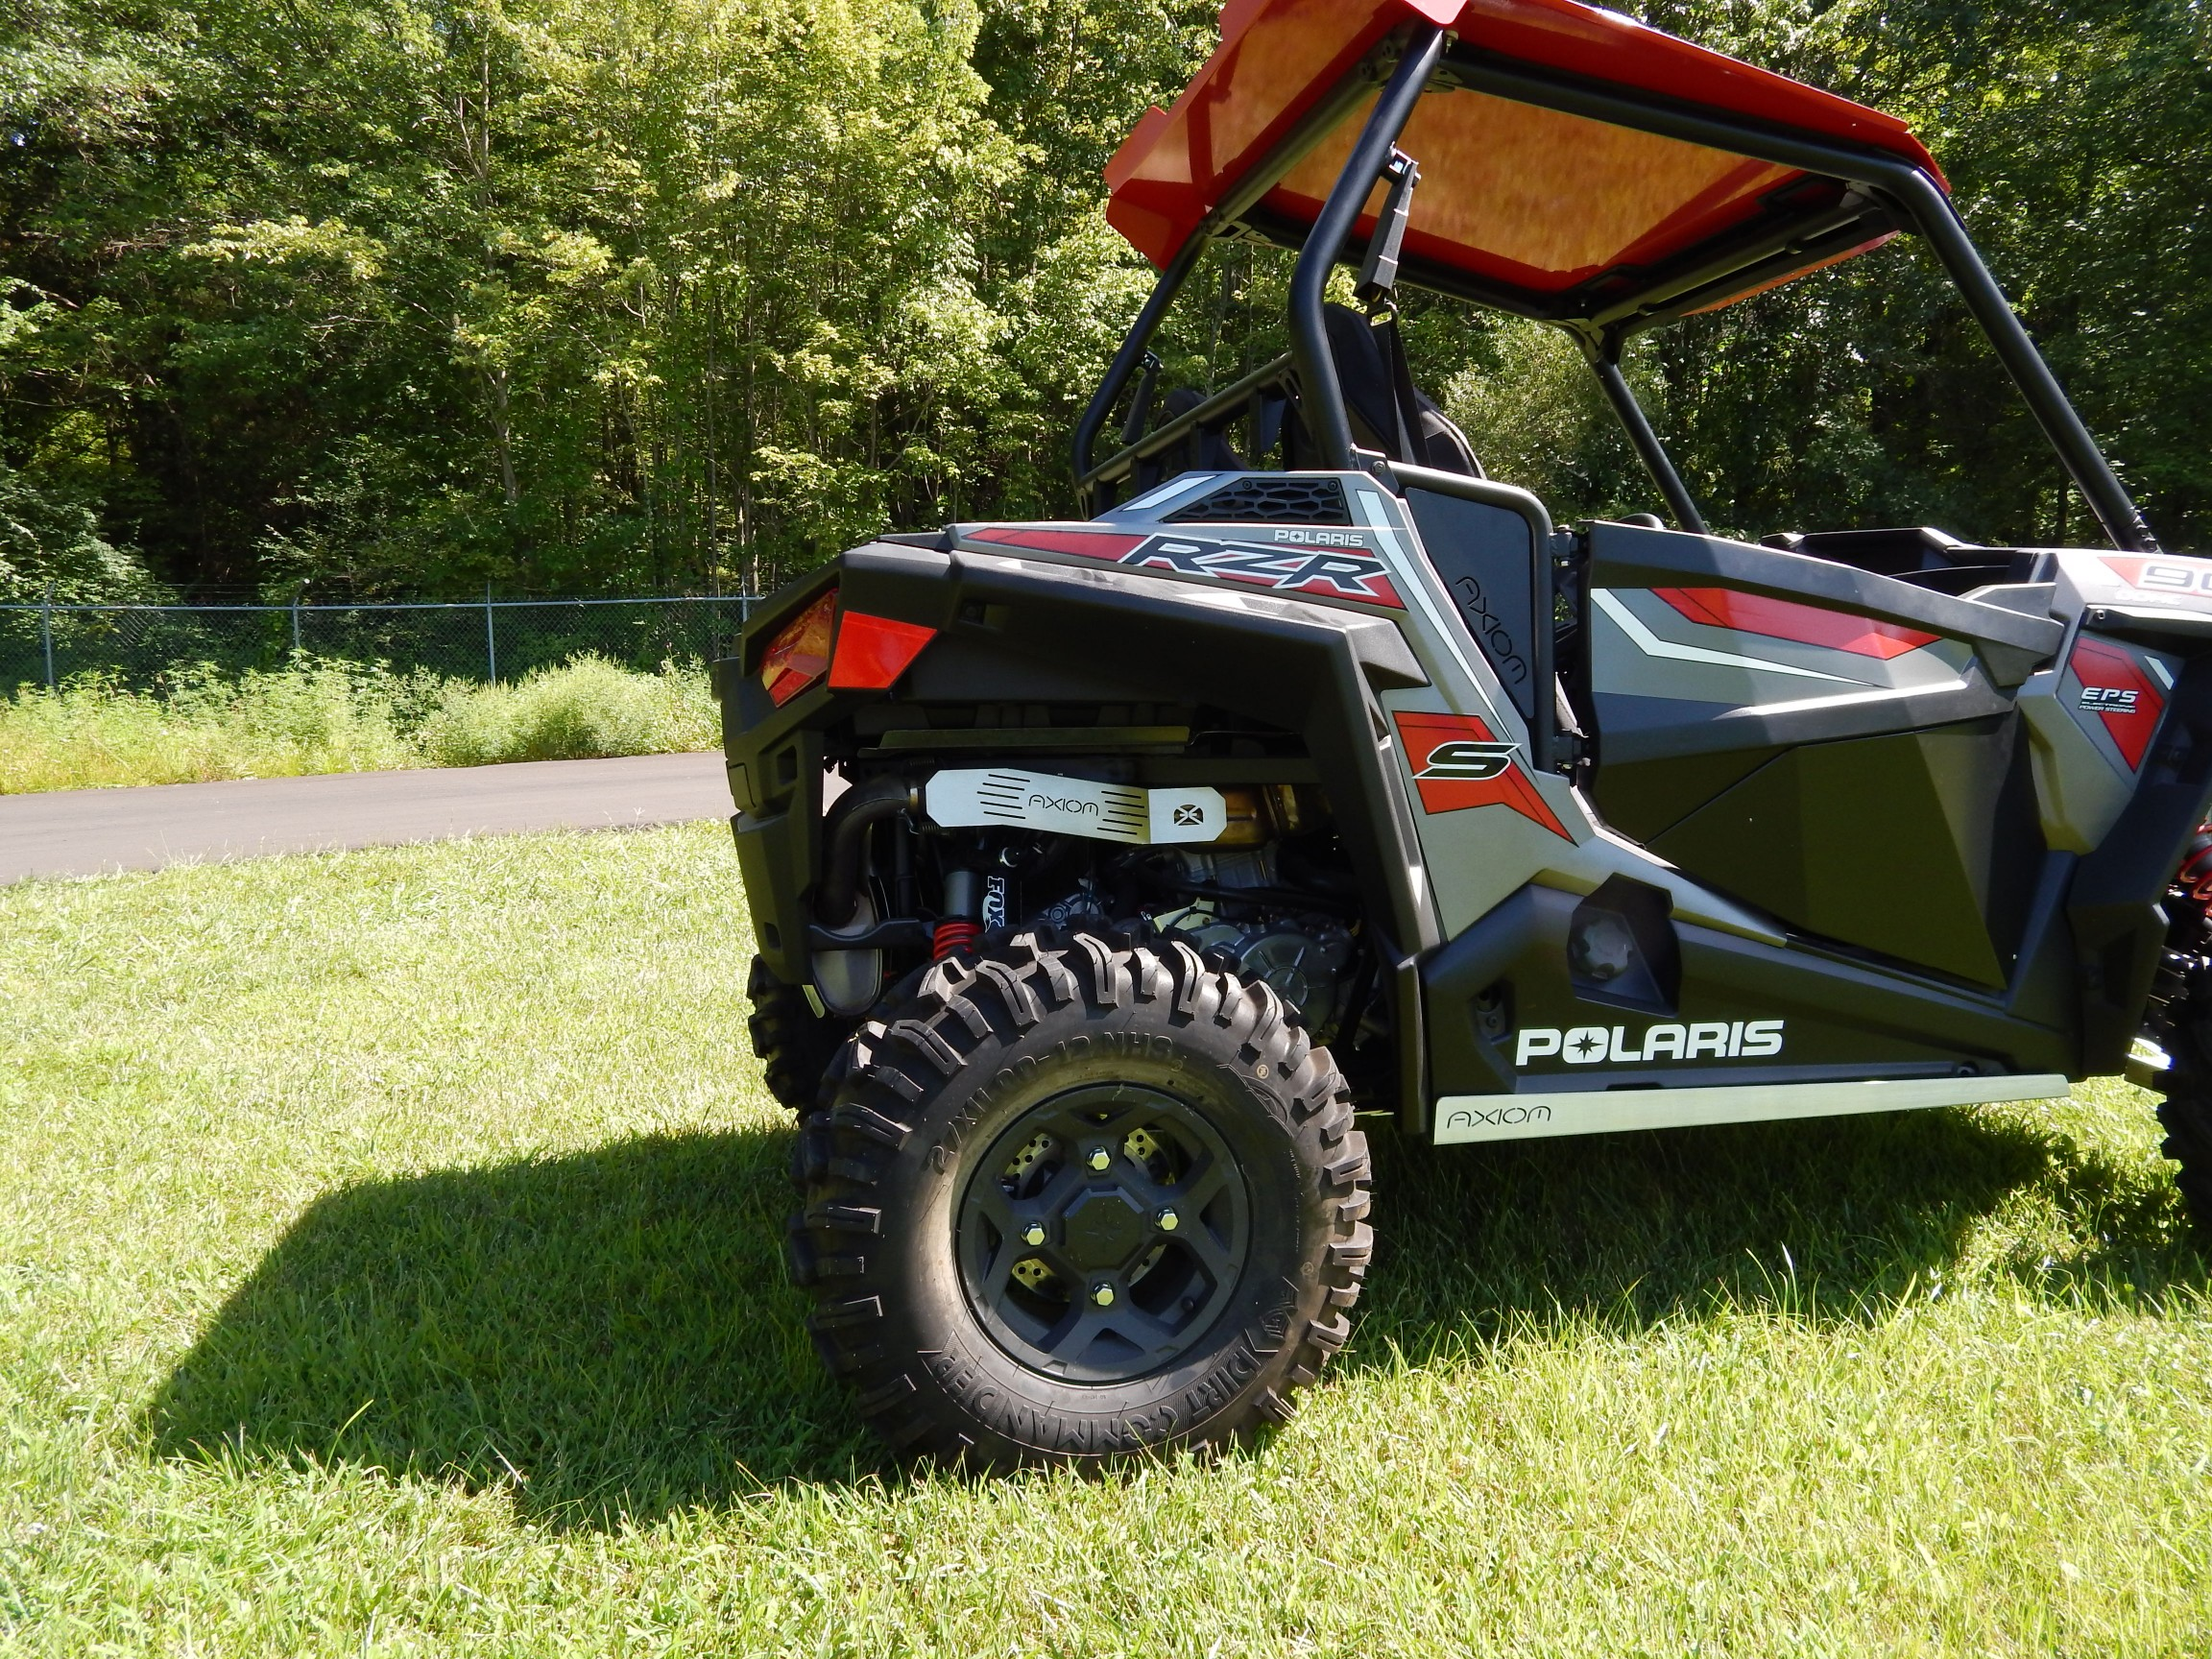 Polaris RZR 900 & RZR 1000 S Exhaust Cover